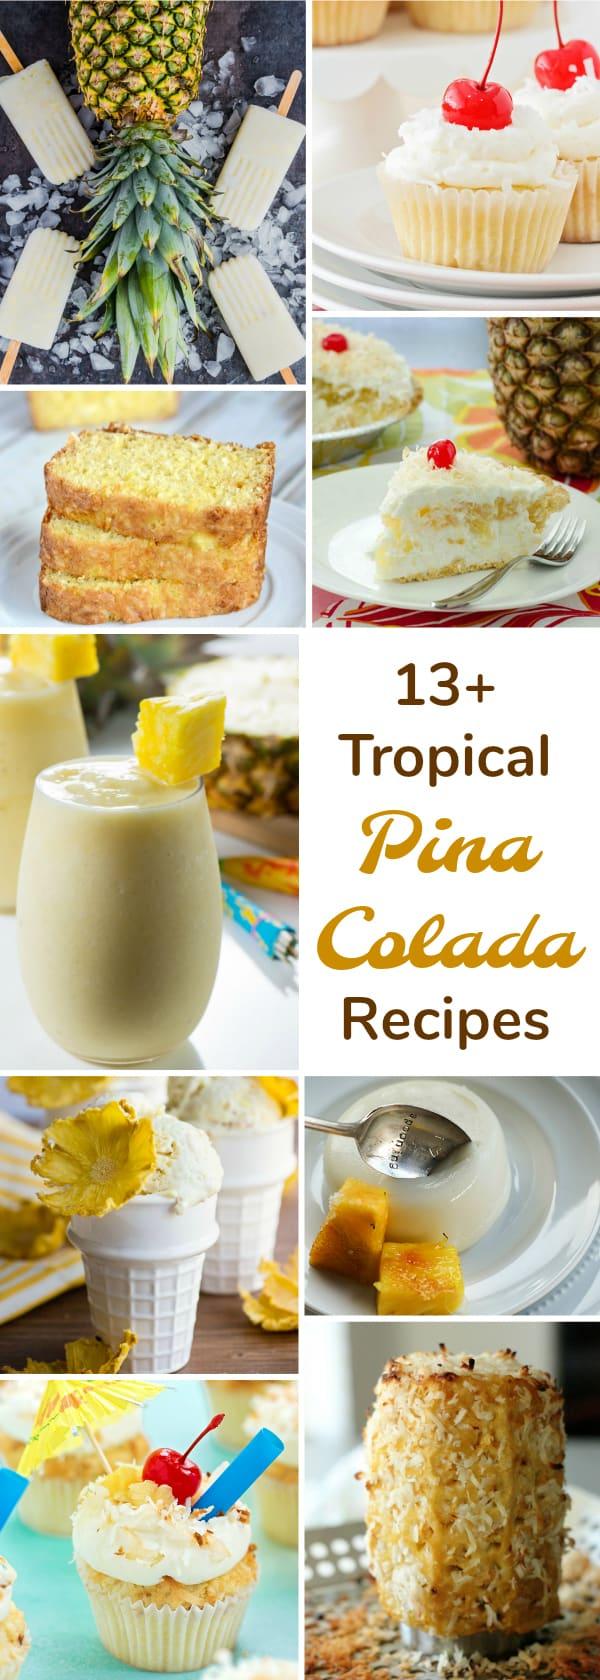 13 Tropical Pina Colada Recipes